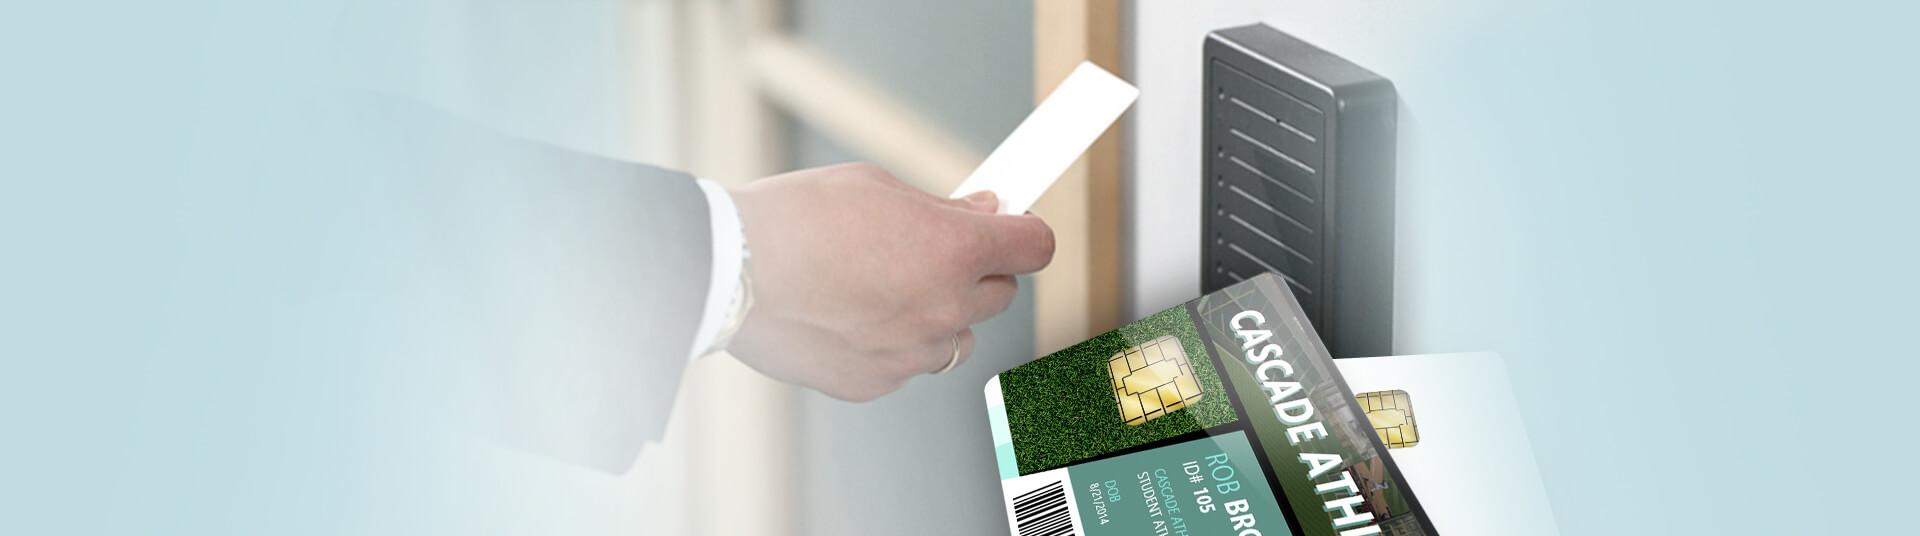 Proximity & Smart Cards